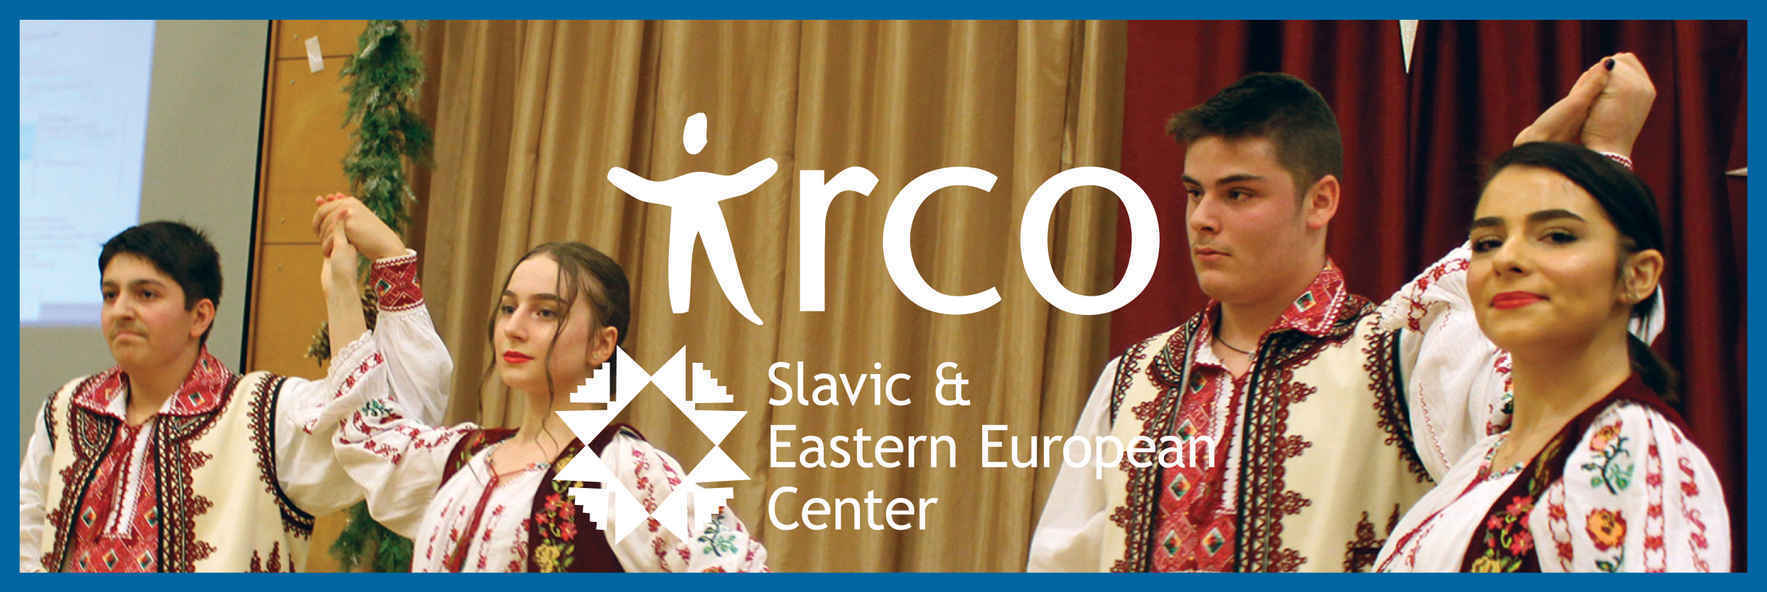 Support IRCO's Slavic & Eastern European Center! image